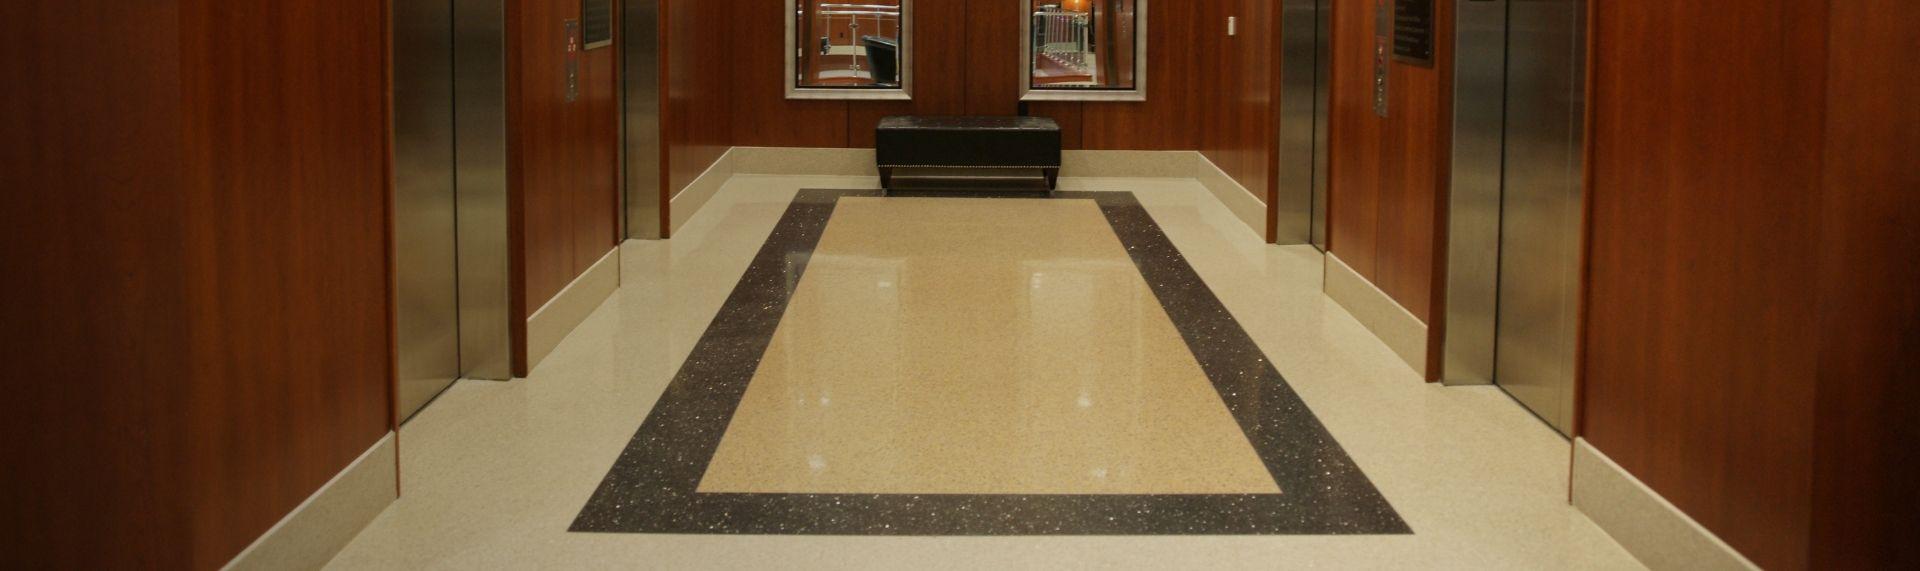 Terrazzo Maintenance and Floor Care